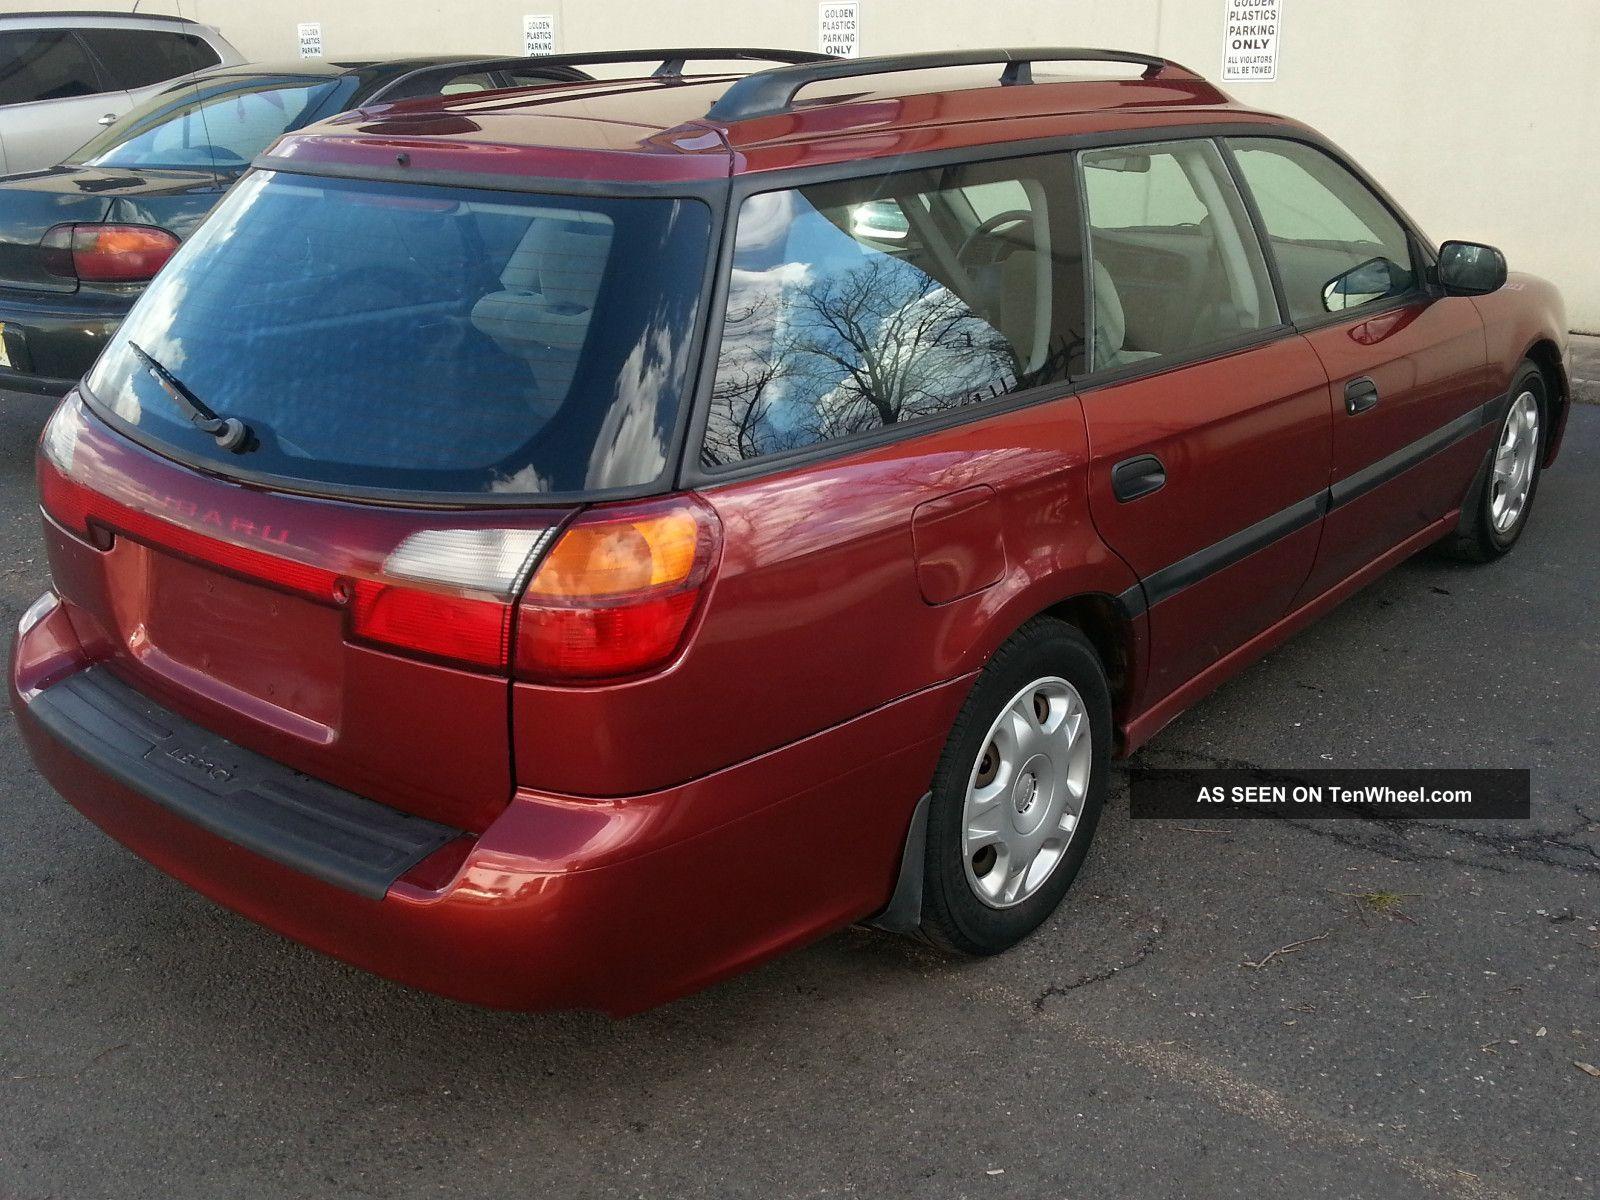 2002 subaru legacy l wagon auto only 117k. Black Bedroom Furniture Sets. Home Design Ideas